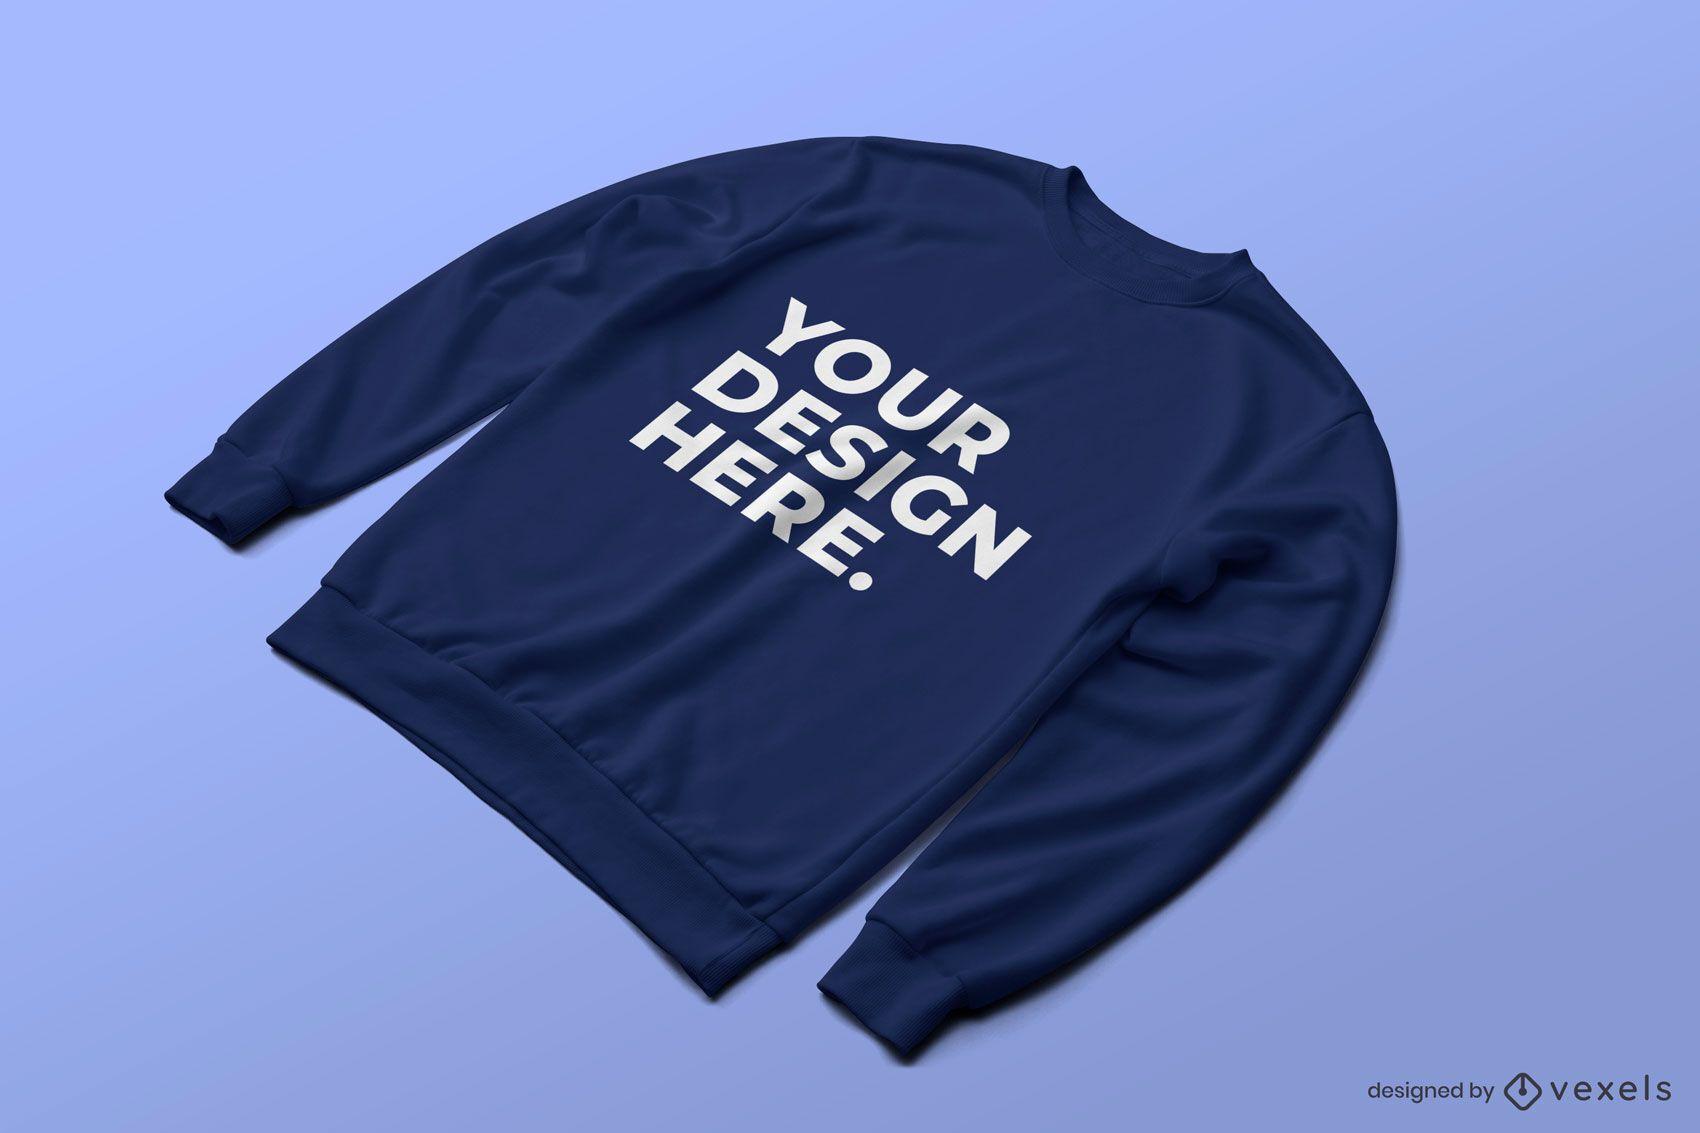 Sweatshirt psd mockup design